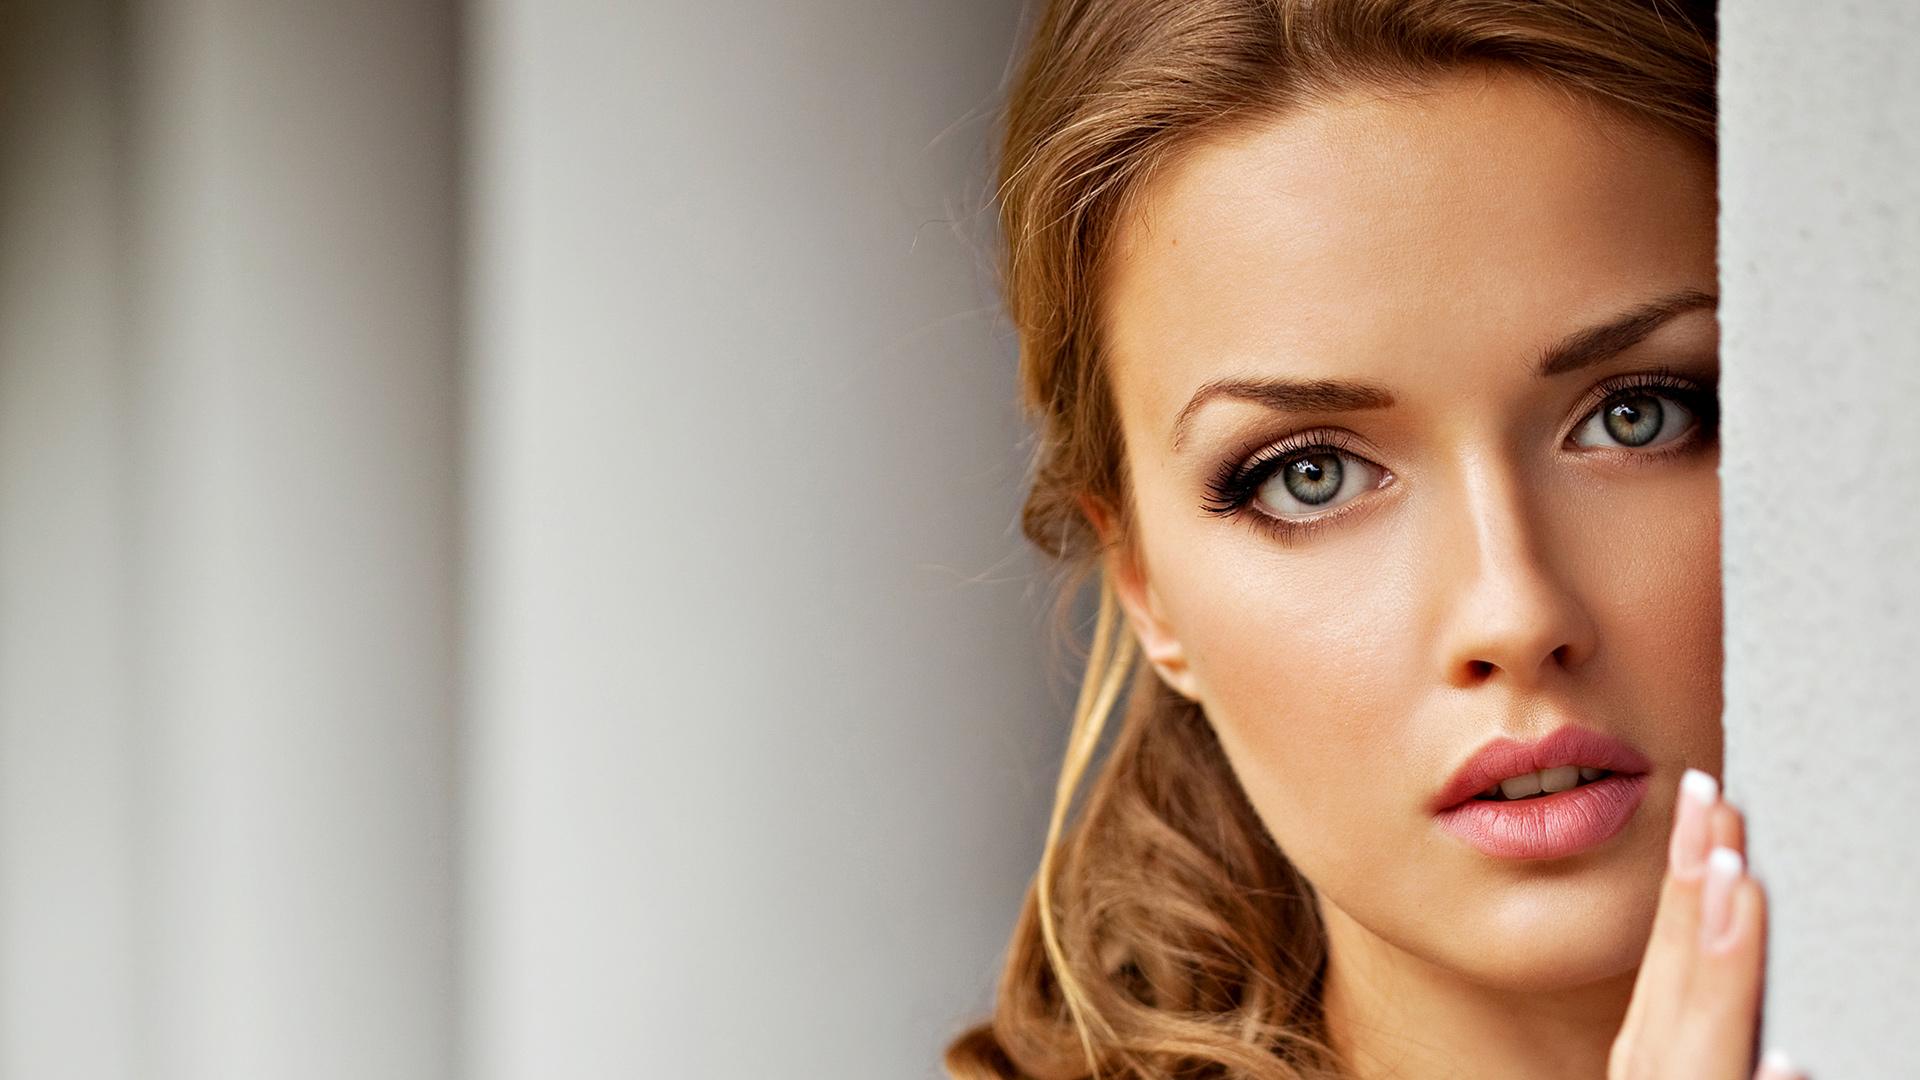 Beautiful girls face wallpapers - SF Wallpaper